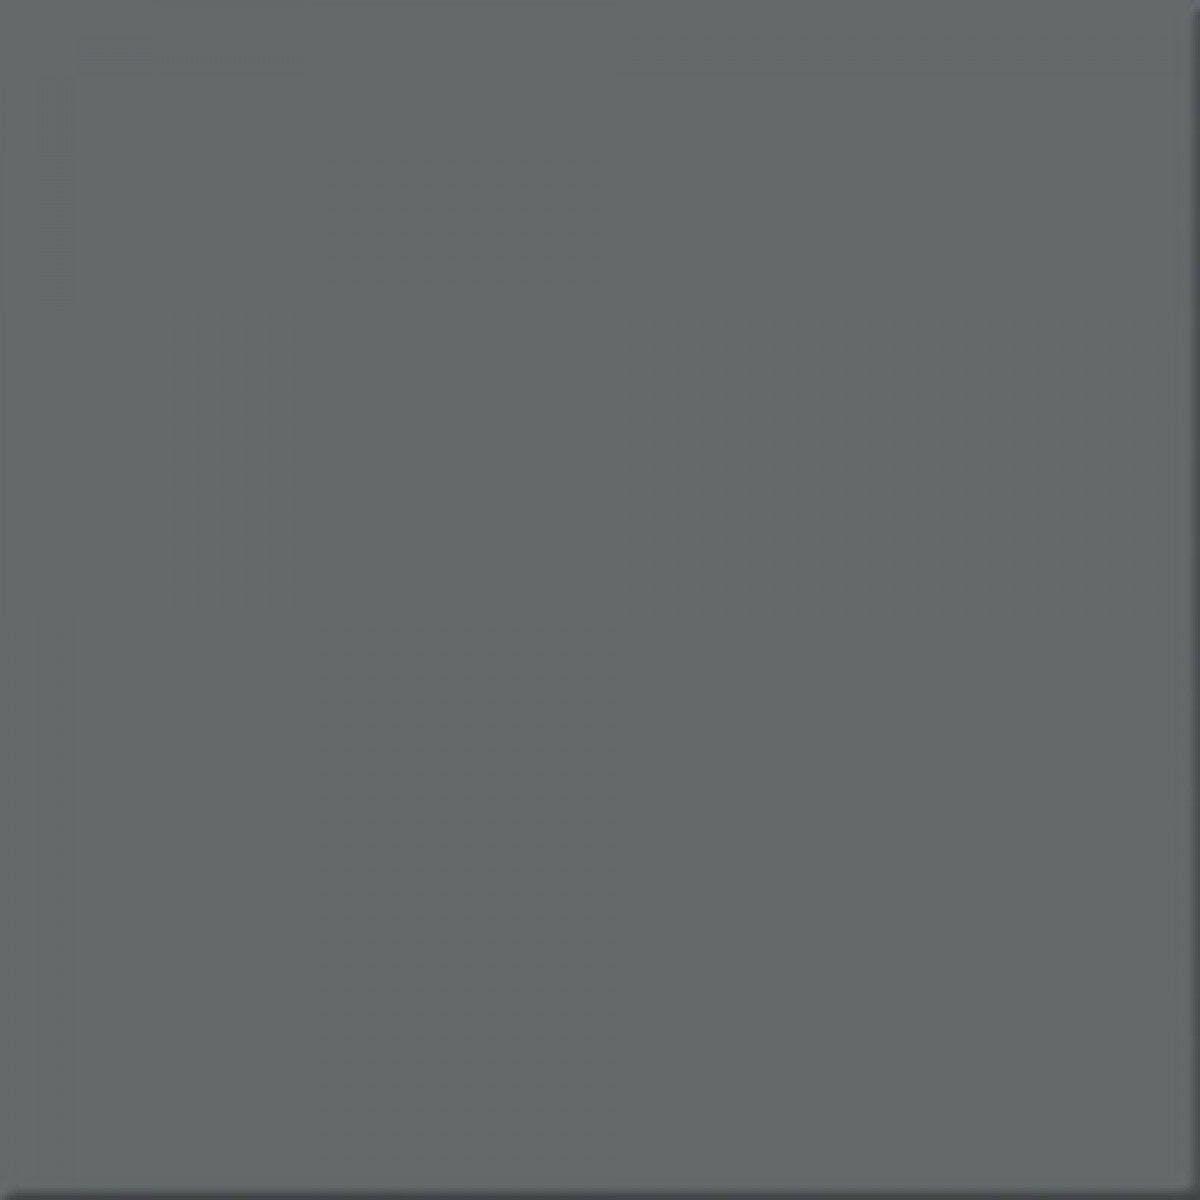 Metallic Graphite Gray with Metallic Spark Black